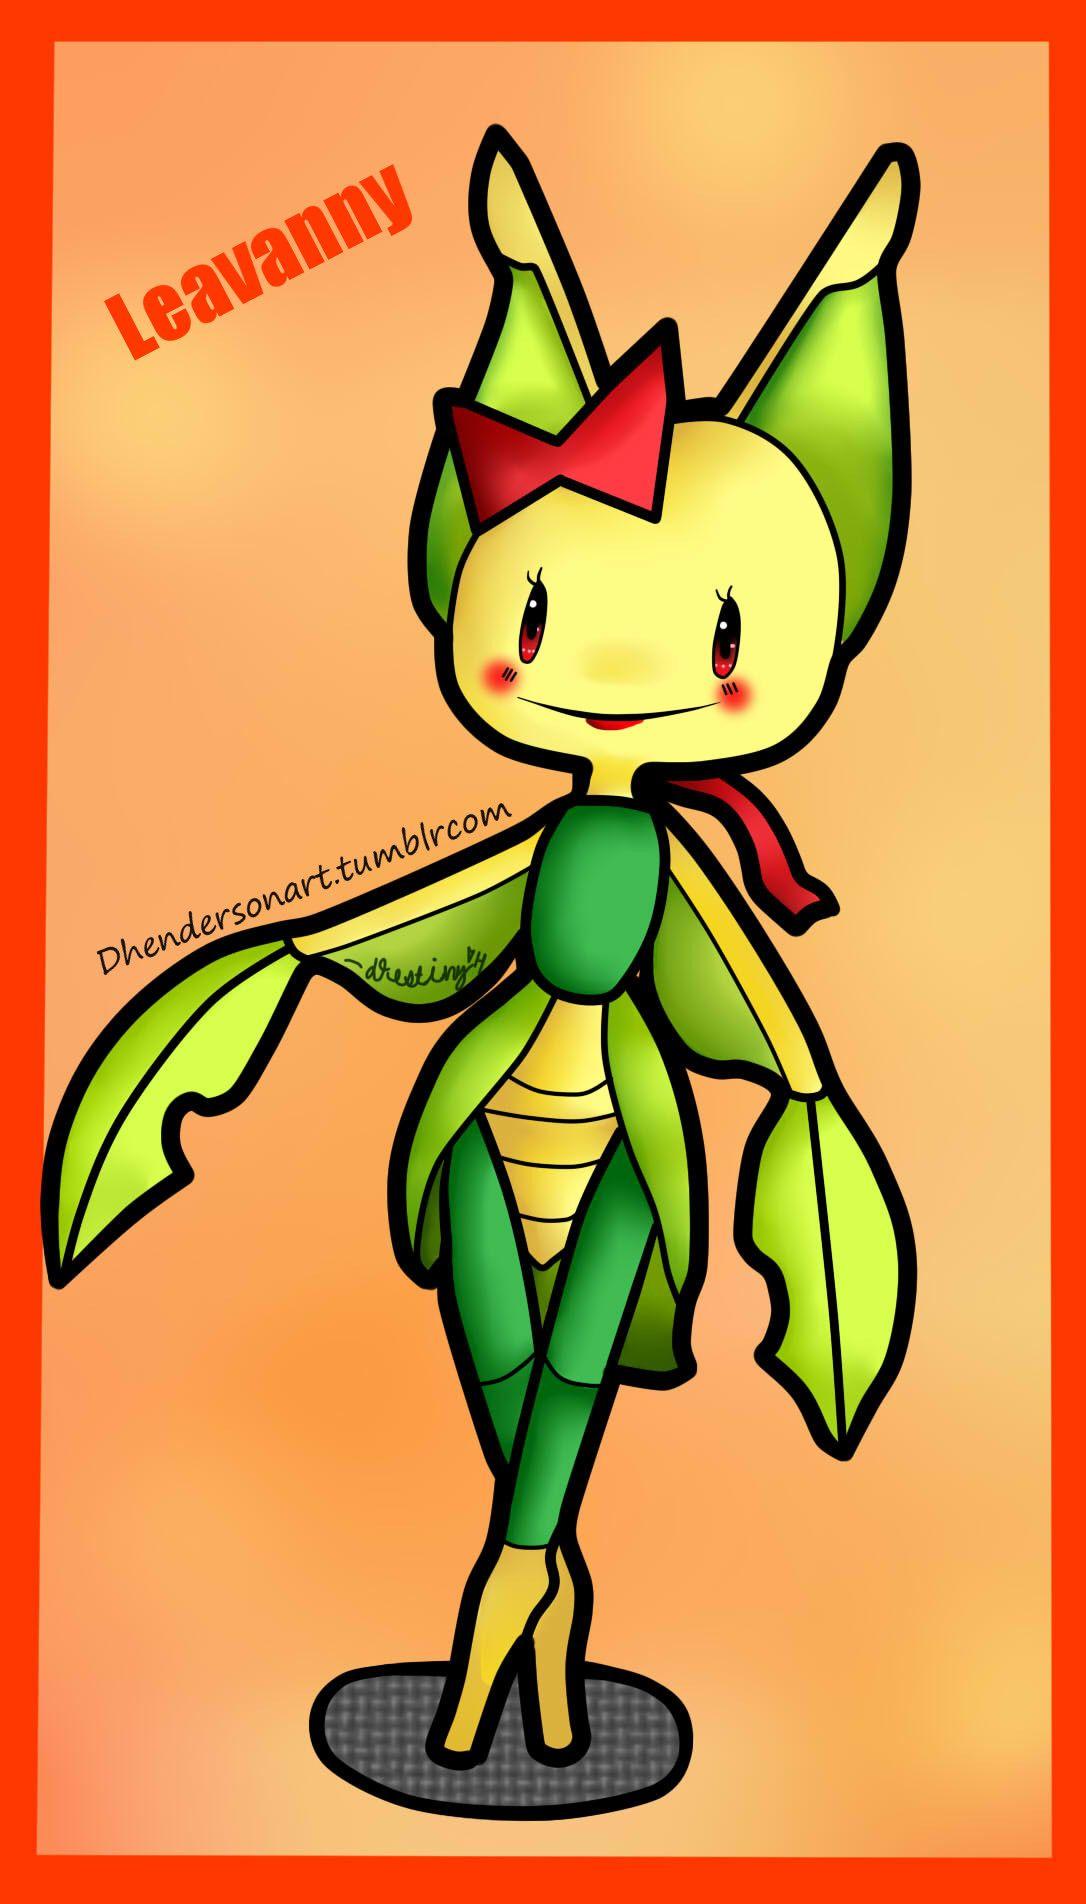 My Leavanny picture pokemon Pokemon, Art, Mario characters